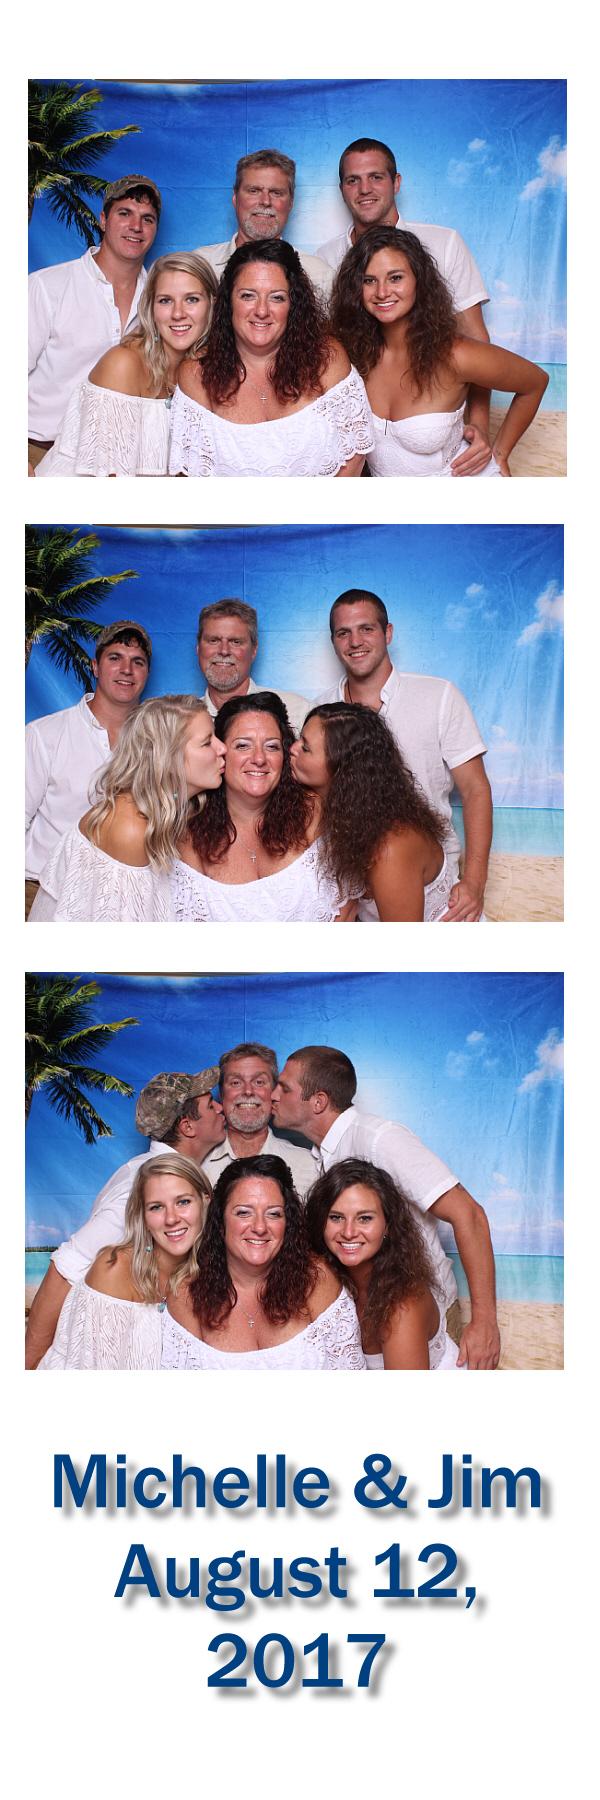 2x6 Wedding Photo Booth Strip - 3 UP